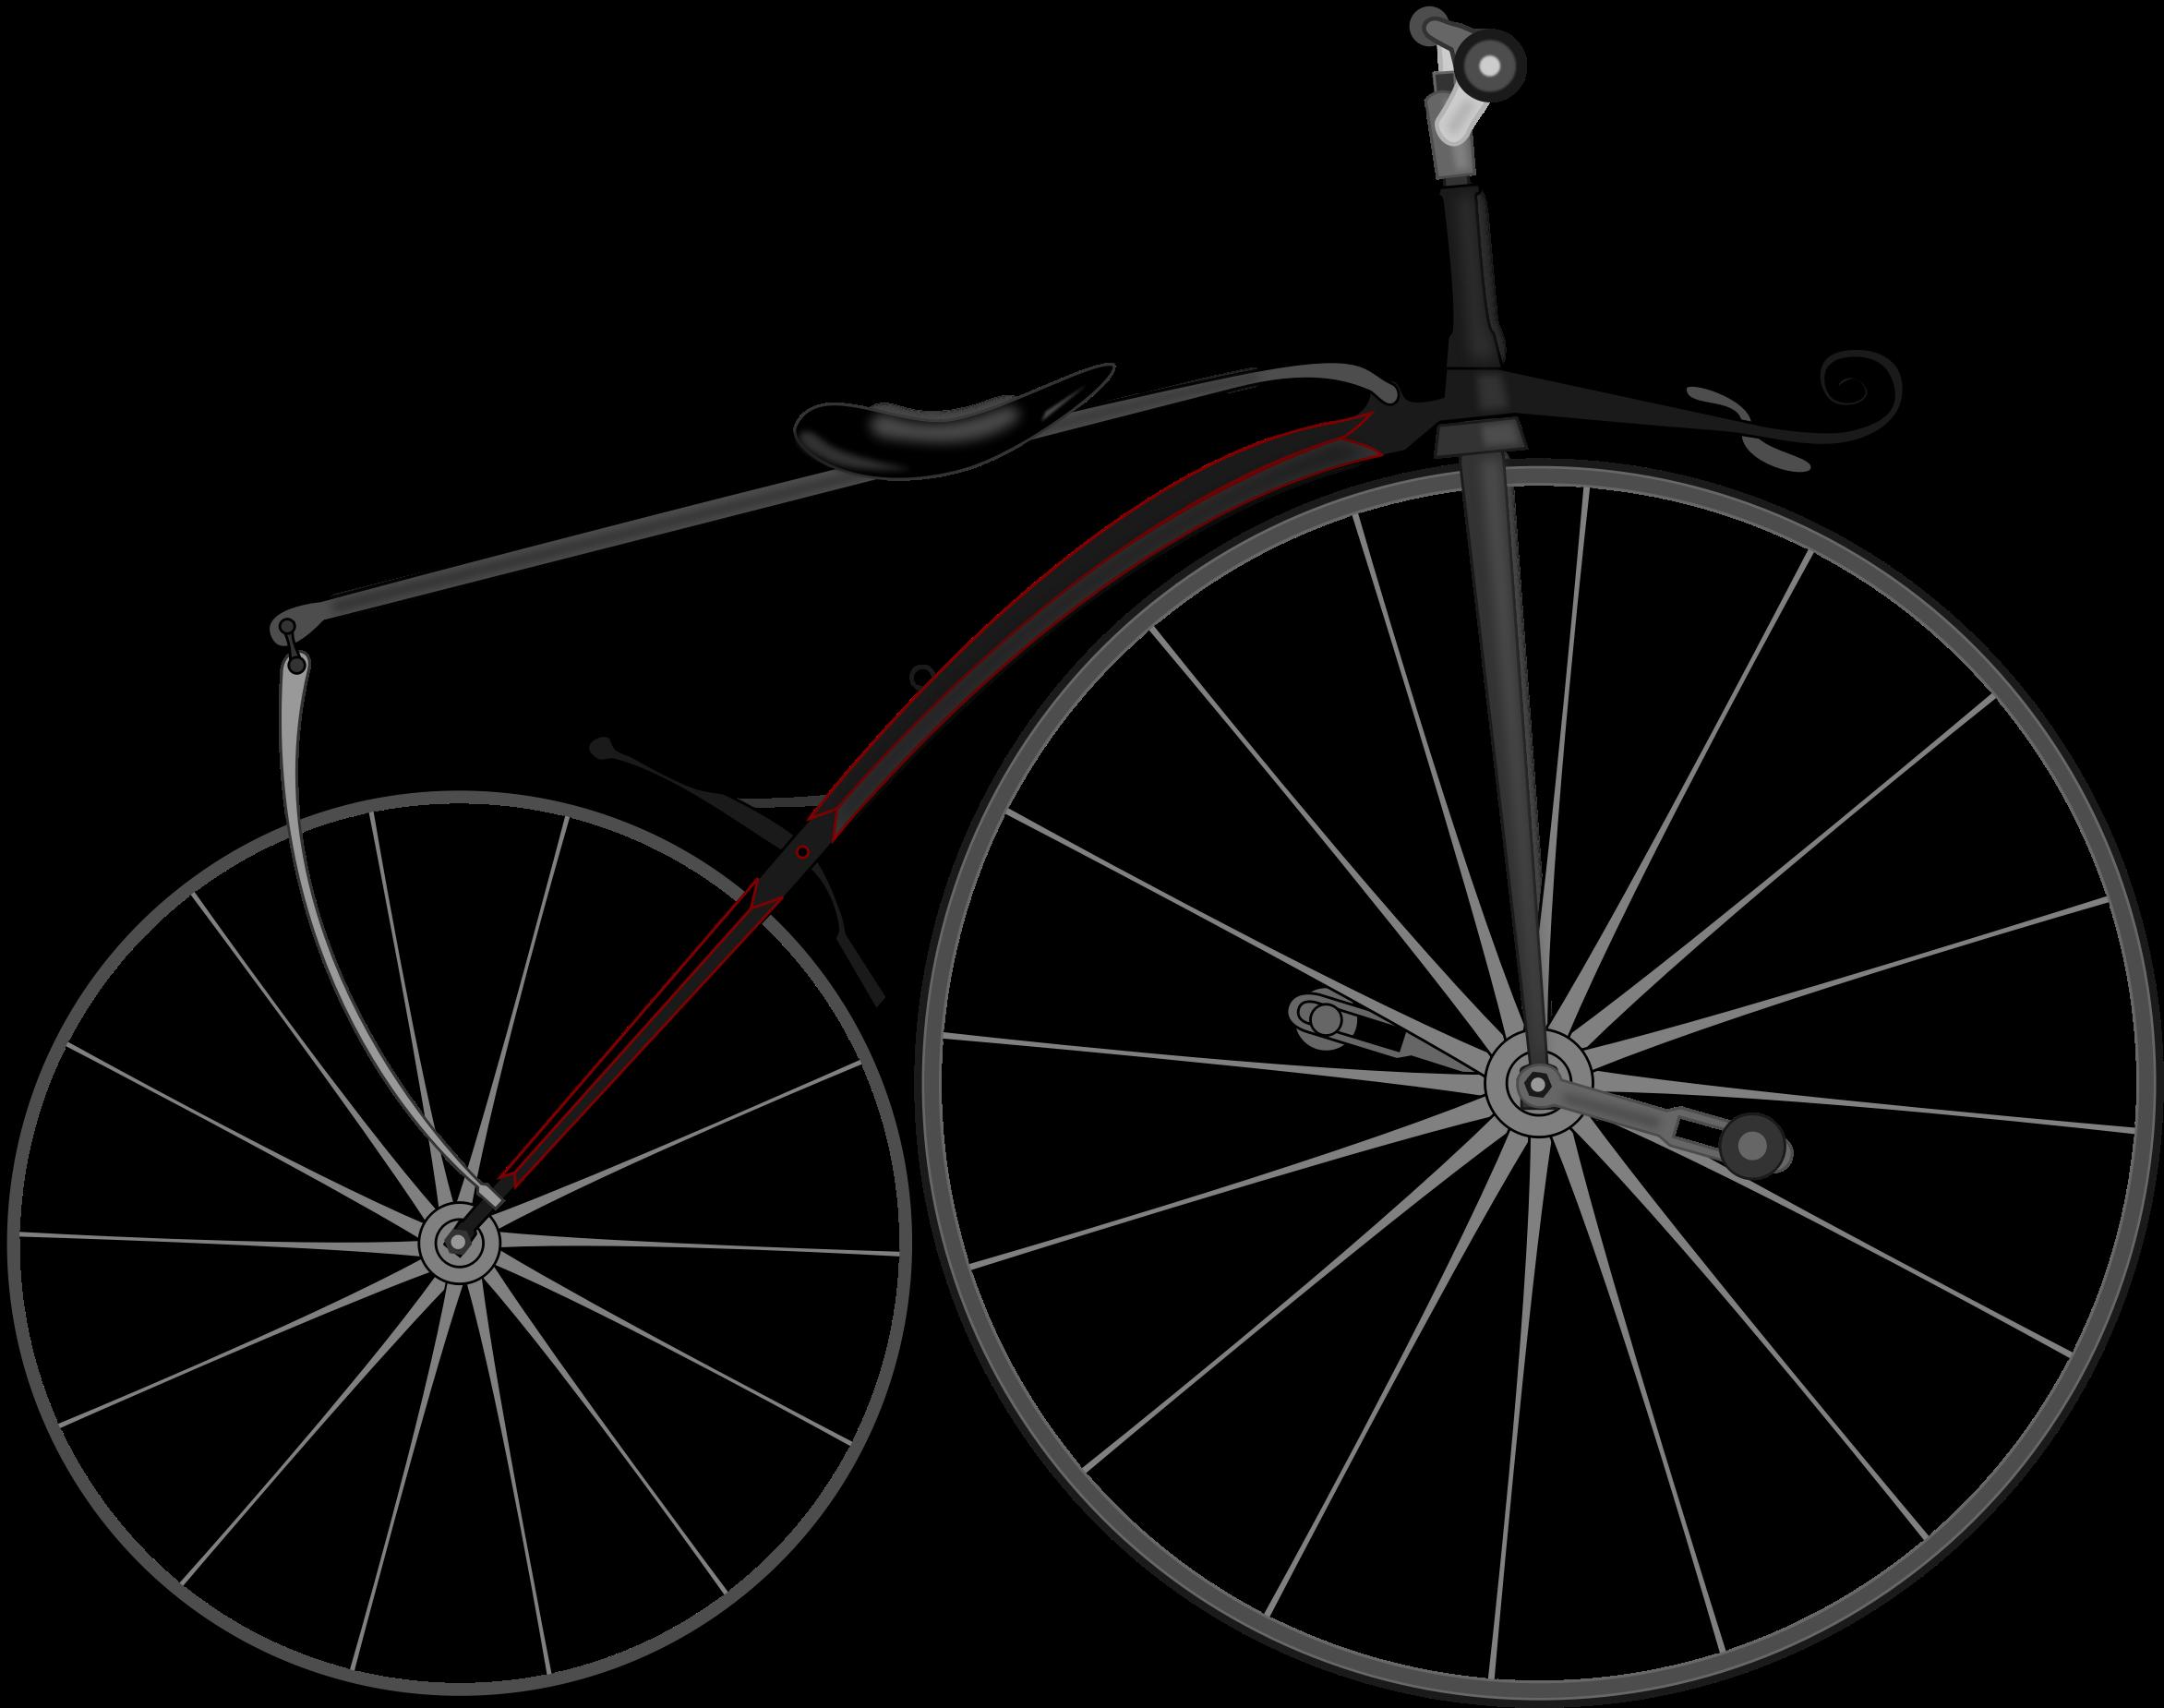 banner royalty free download Biking clipart vintage bicycle.  boneshaker bike by.